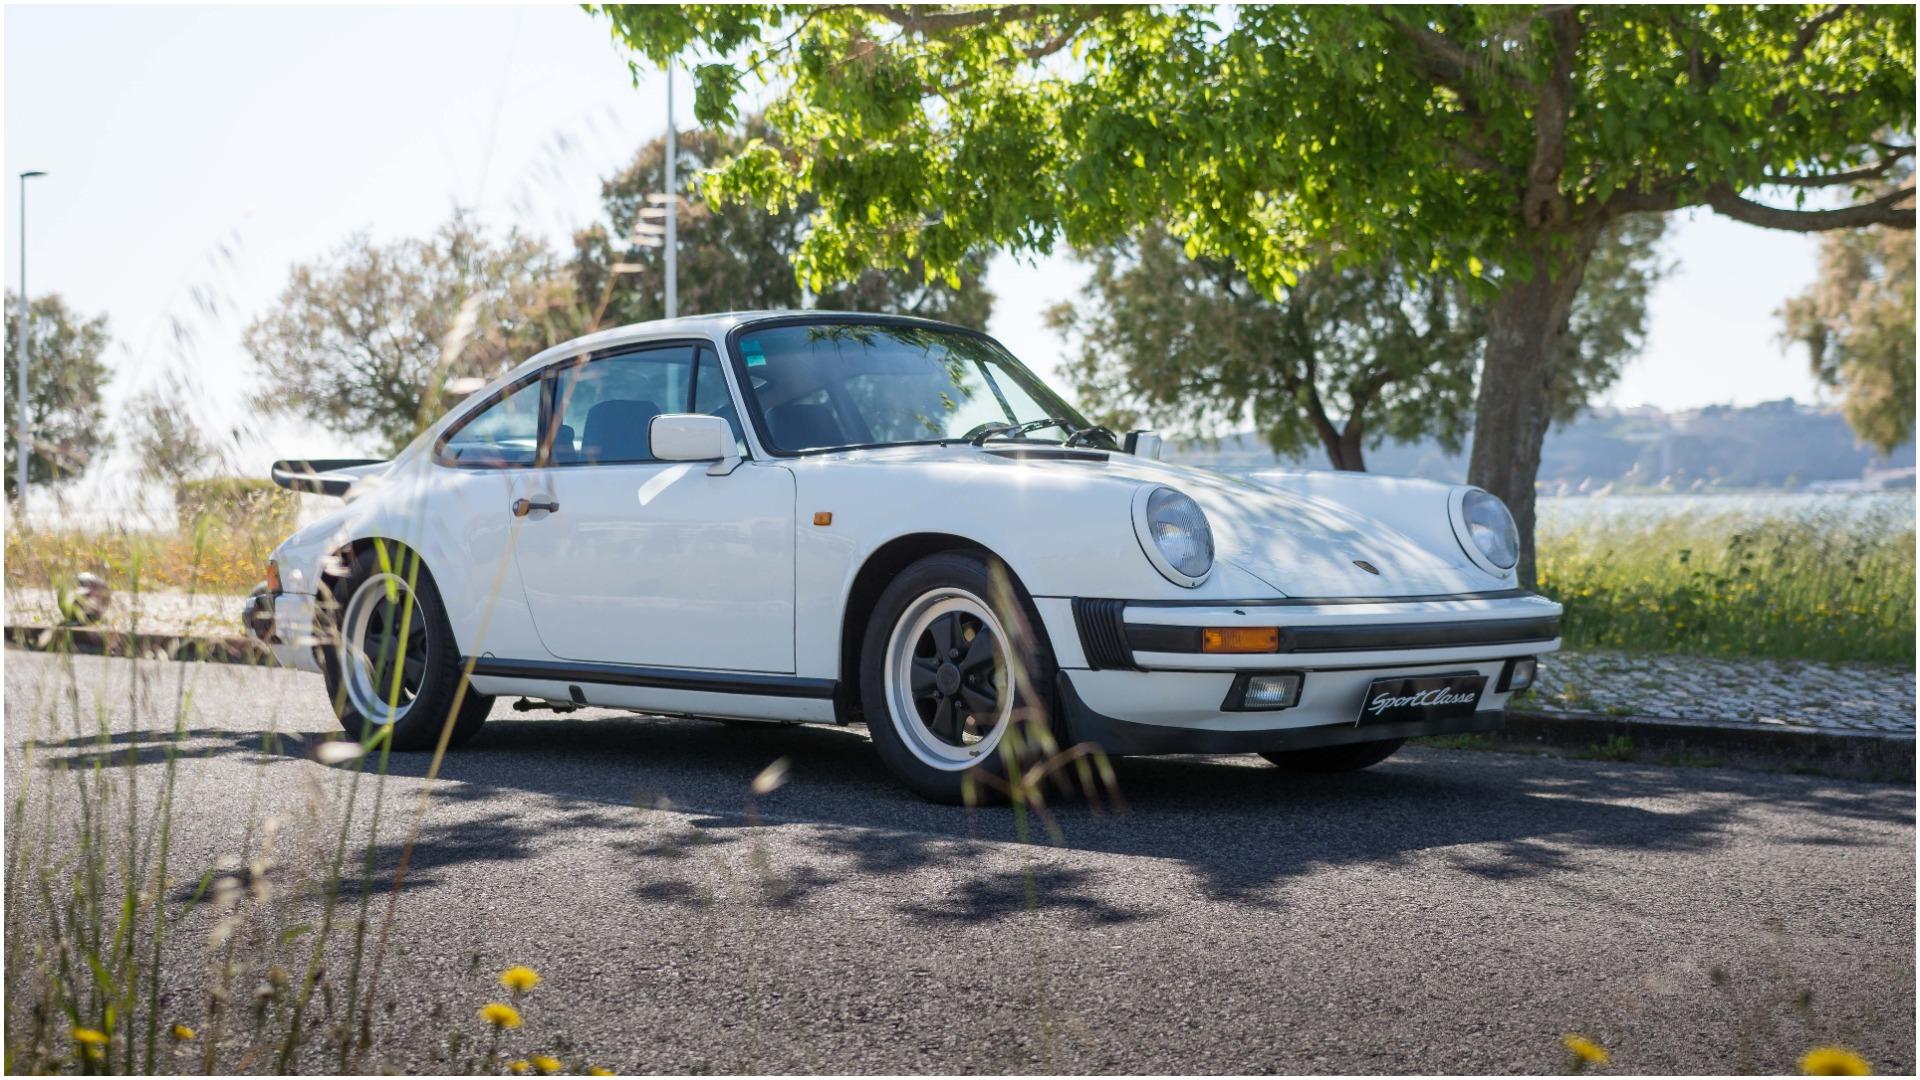 Porsche 911 Carrera RUF (1985)